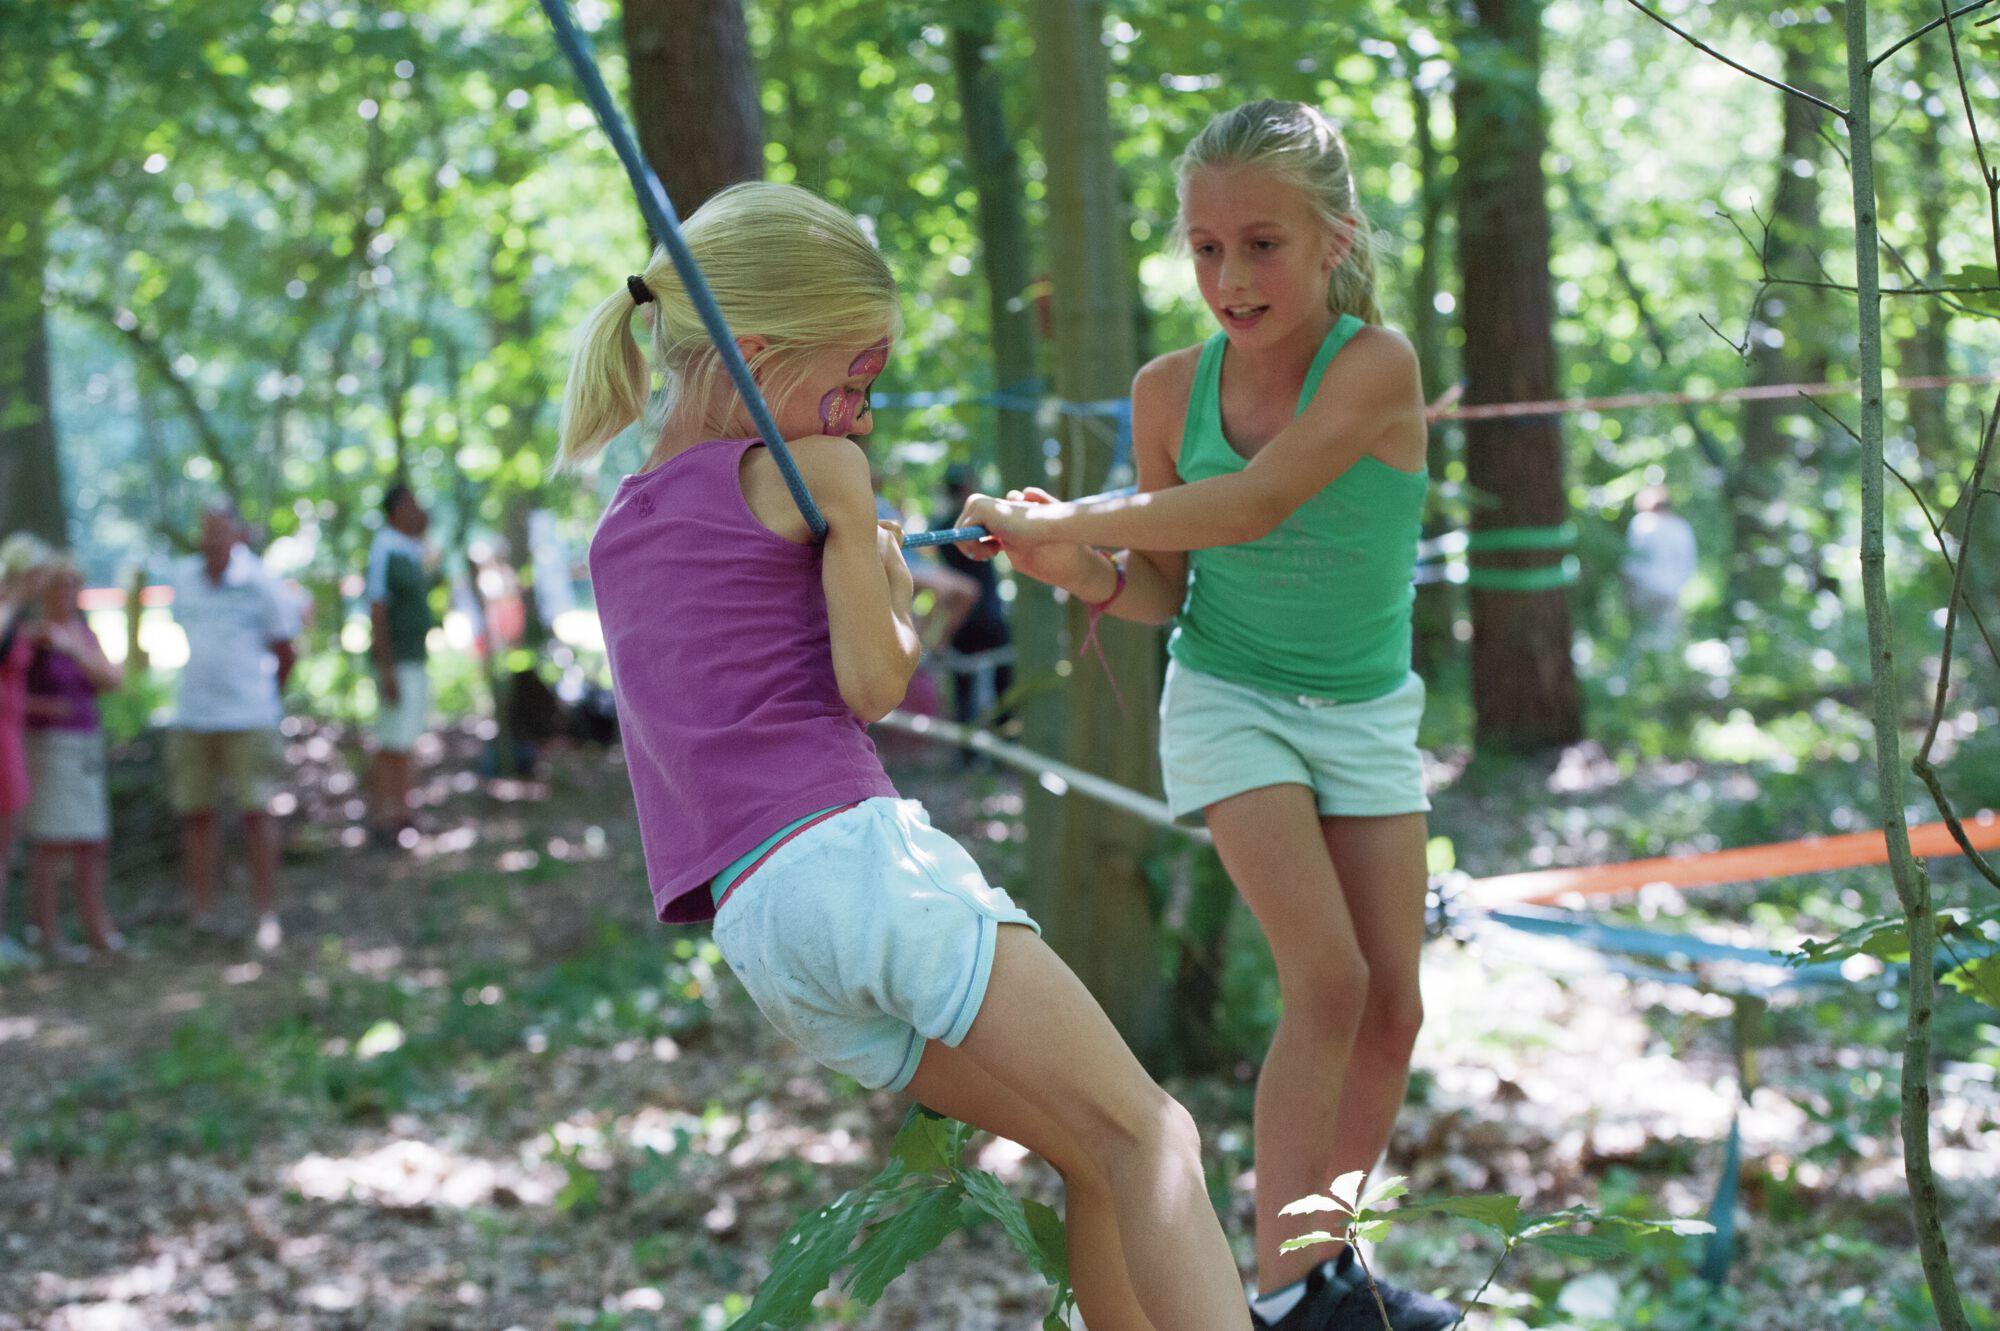 20180701 Speel erop bos Het Leen (26).jpg